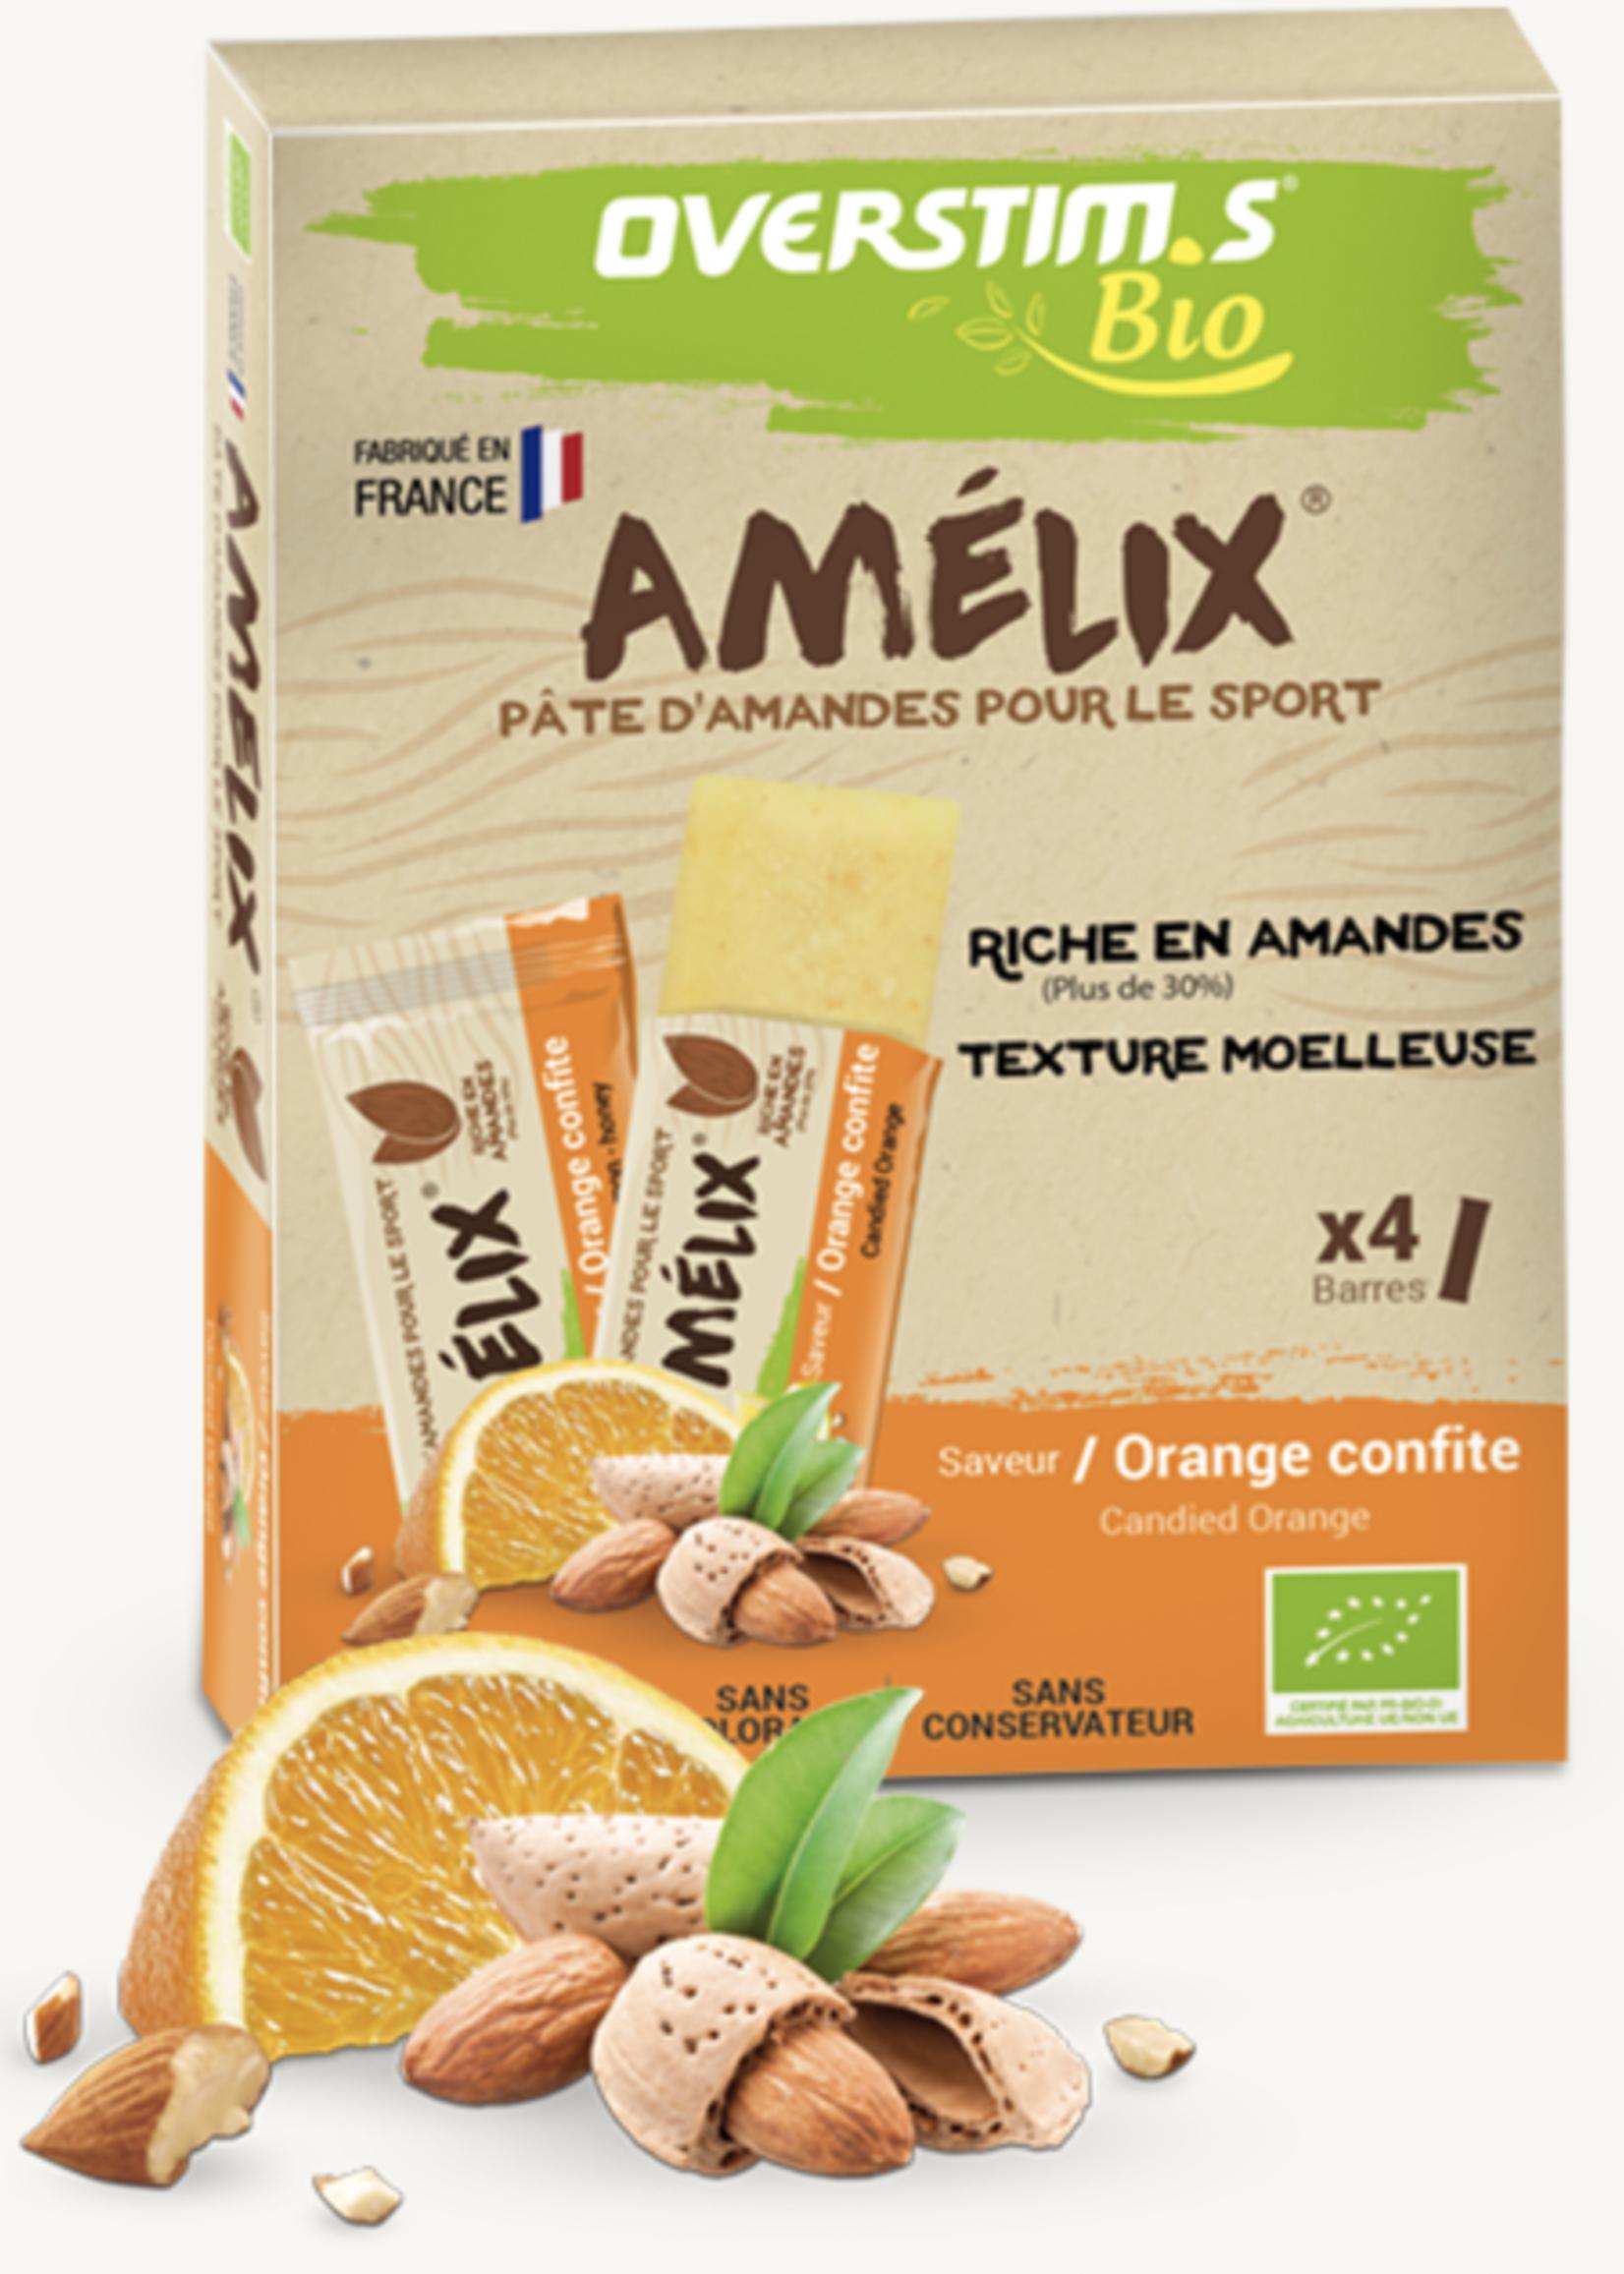 Overstims Overstims Energy Bar - Amelix Organic